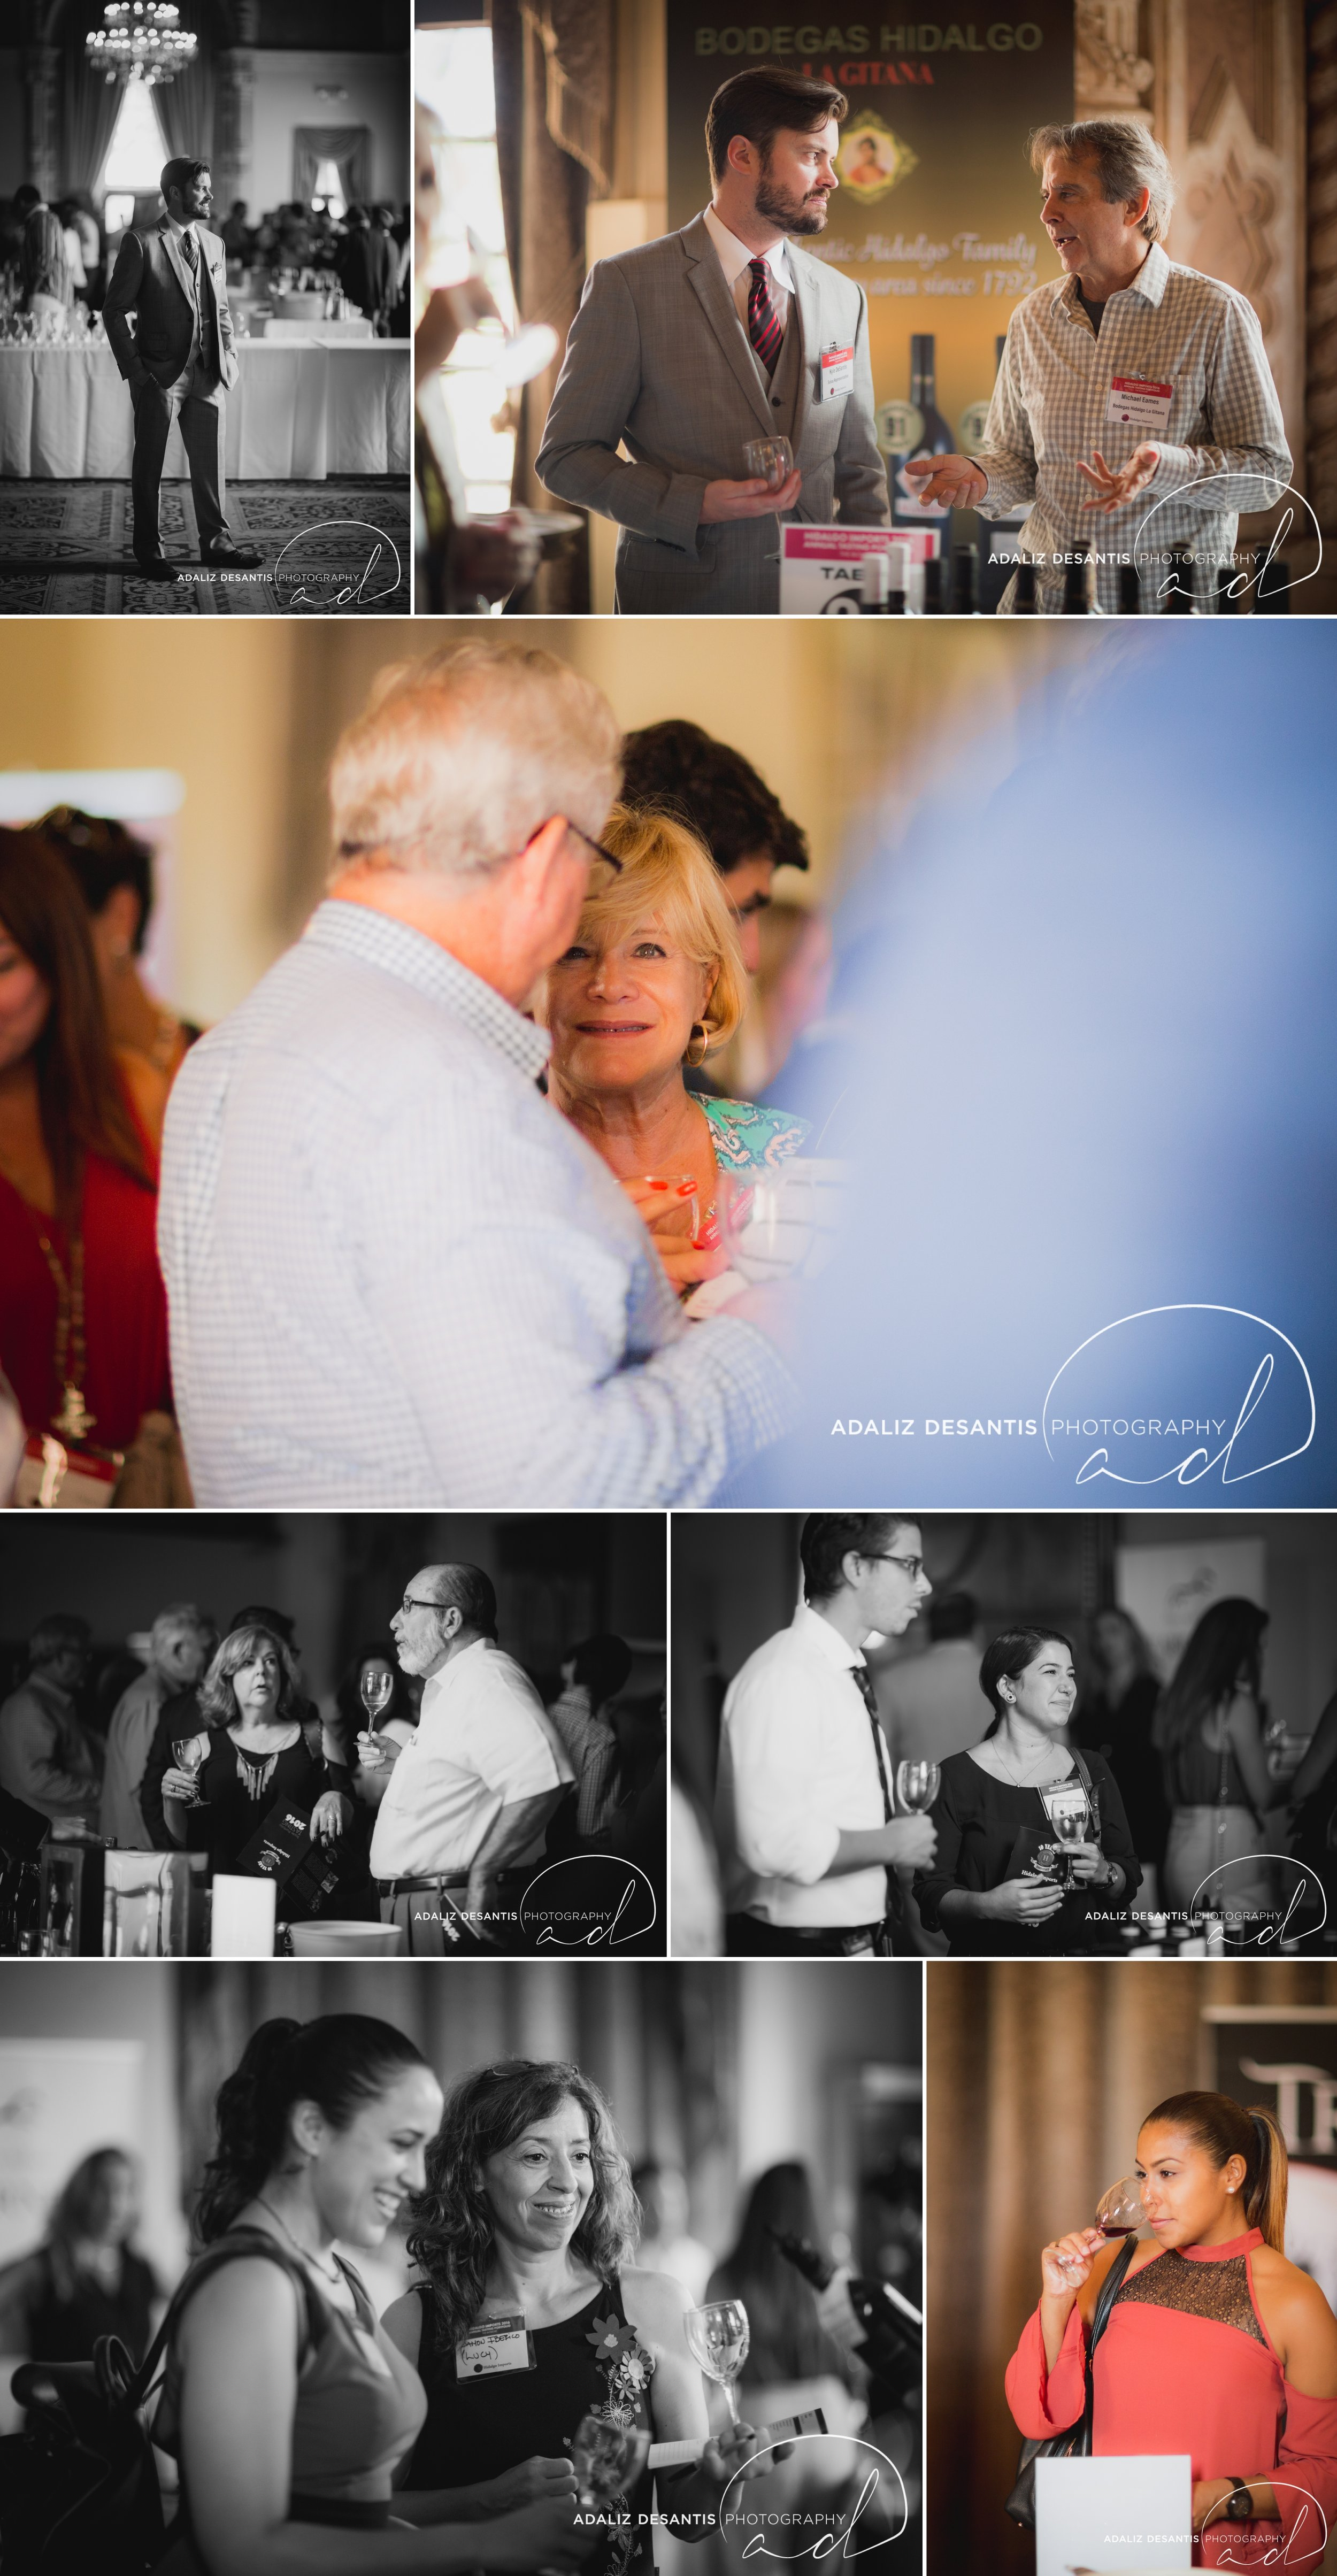 hidalgo imports anniversary wine spirits tasting biltmore hotel coral gables florida miami 8.jpg